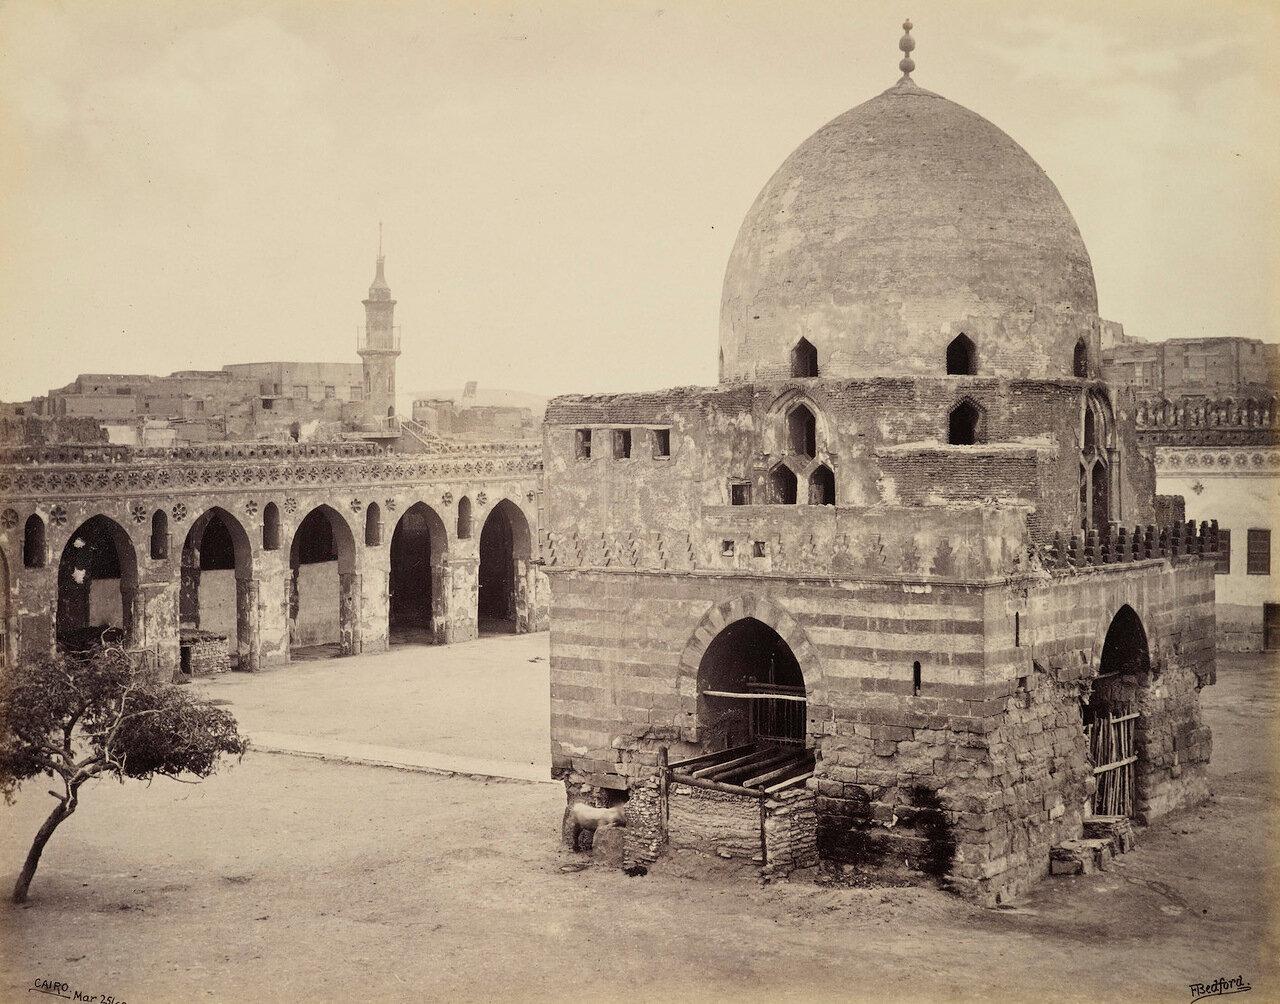 25 марта 1862. Фонтан в мечети Ибн Тулуна, Каир